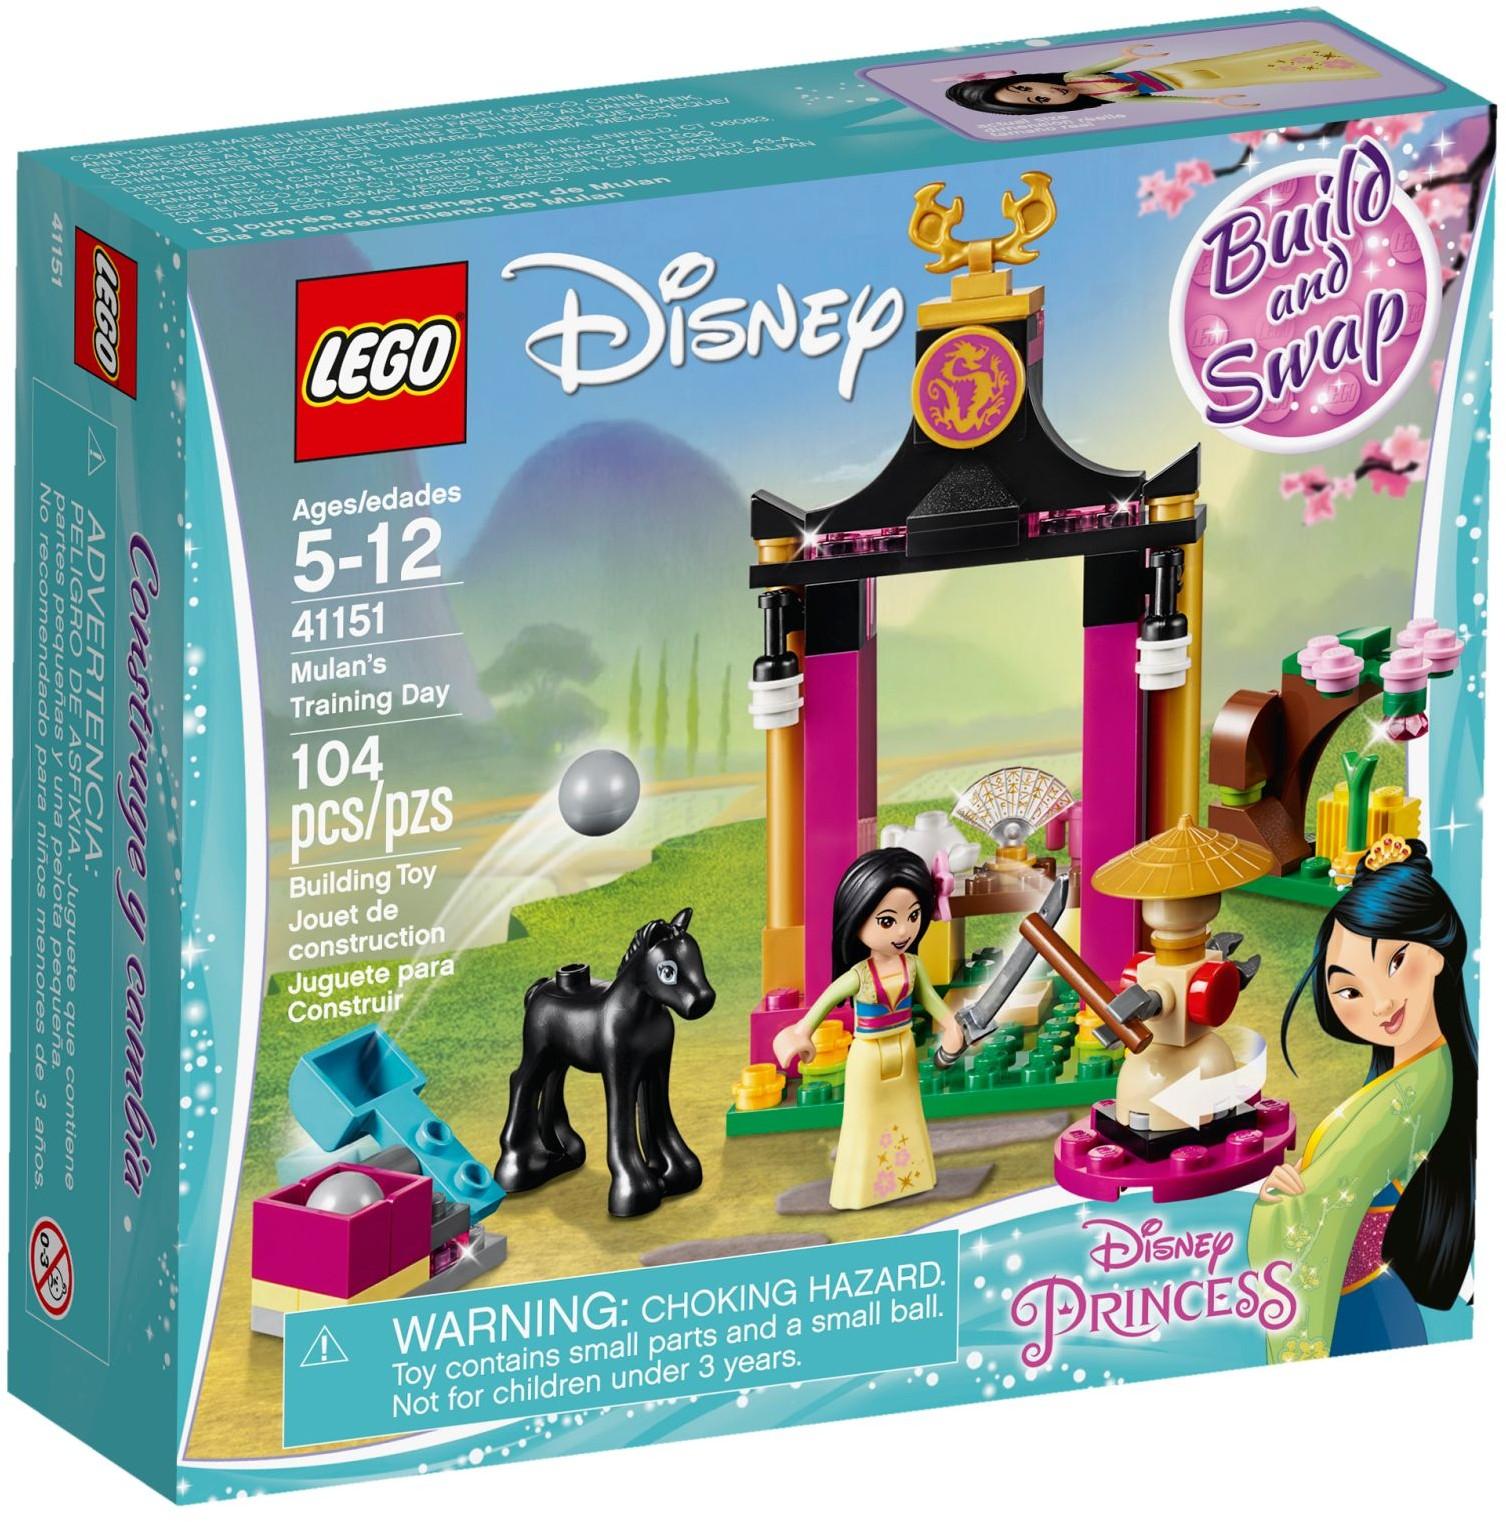 Lego Disney Princess Sets 41151 Mulans Training Day New